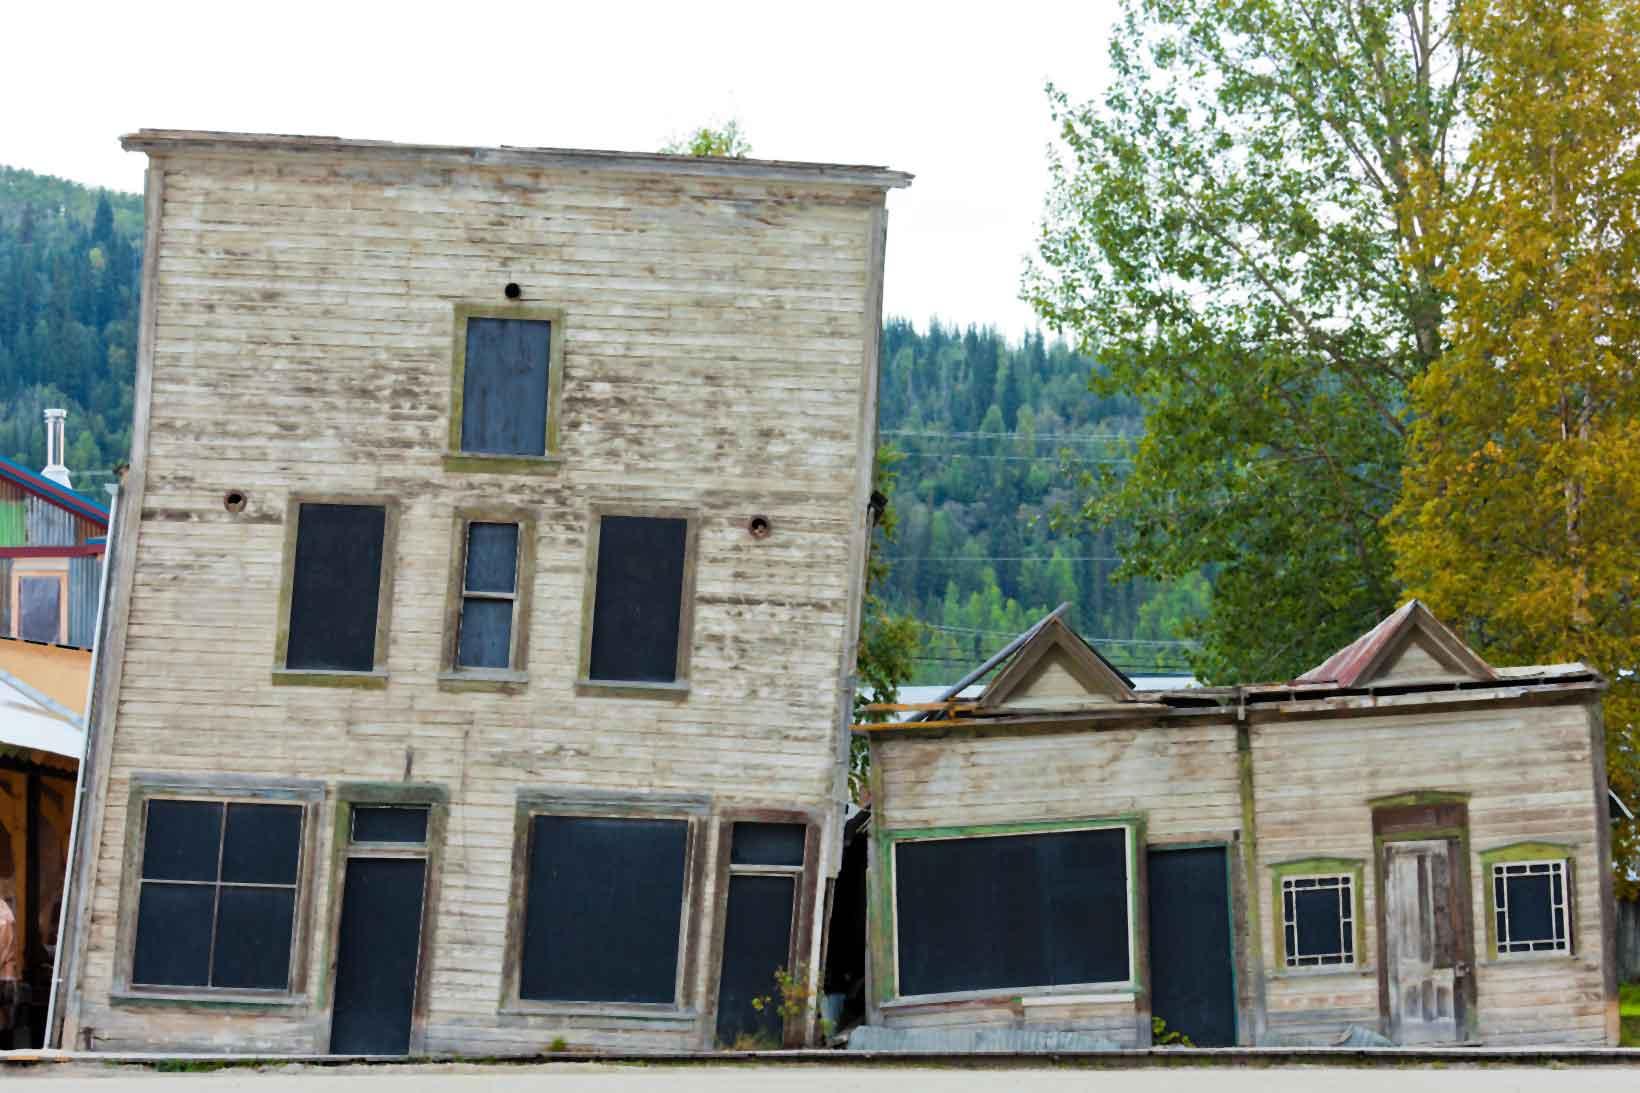 Slanting buildings on permafrost